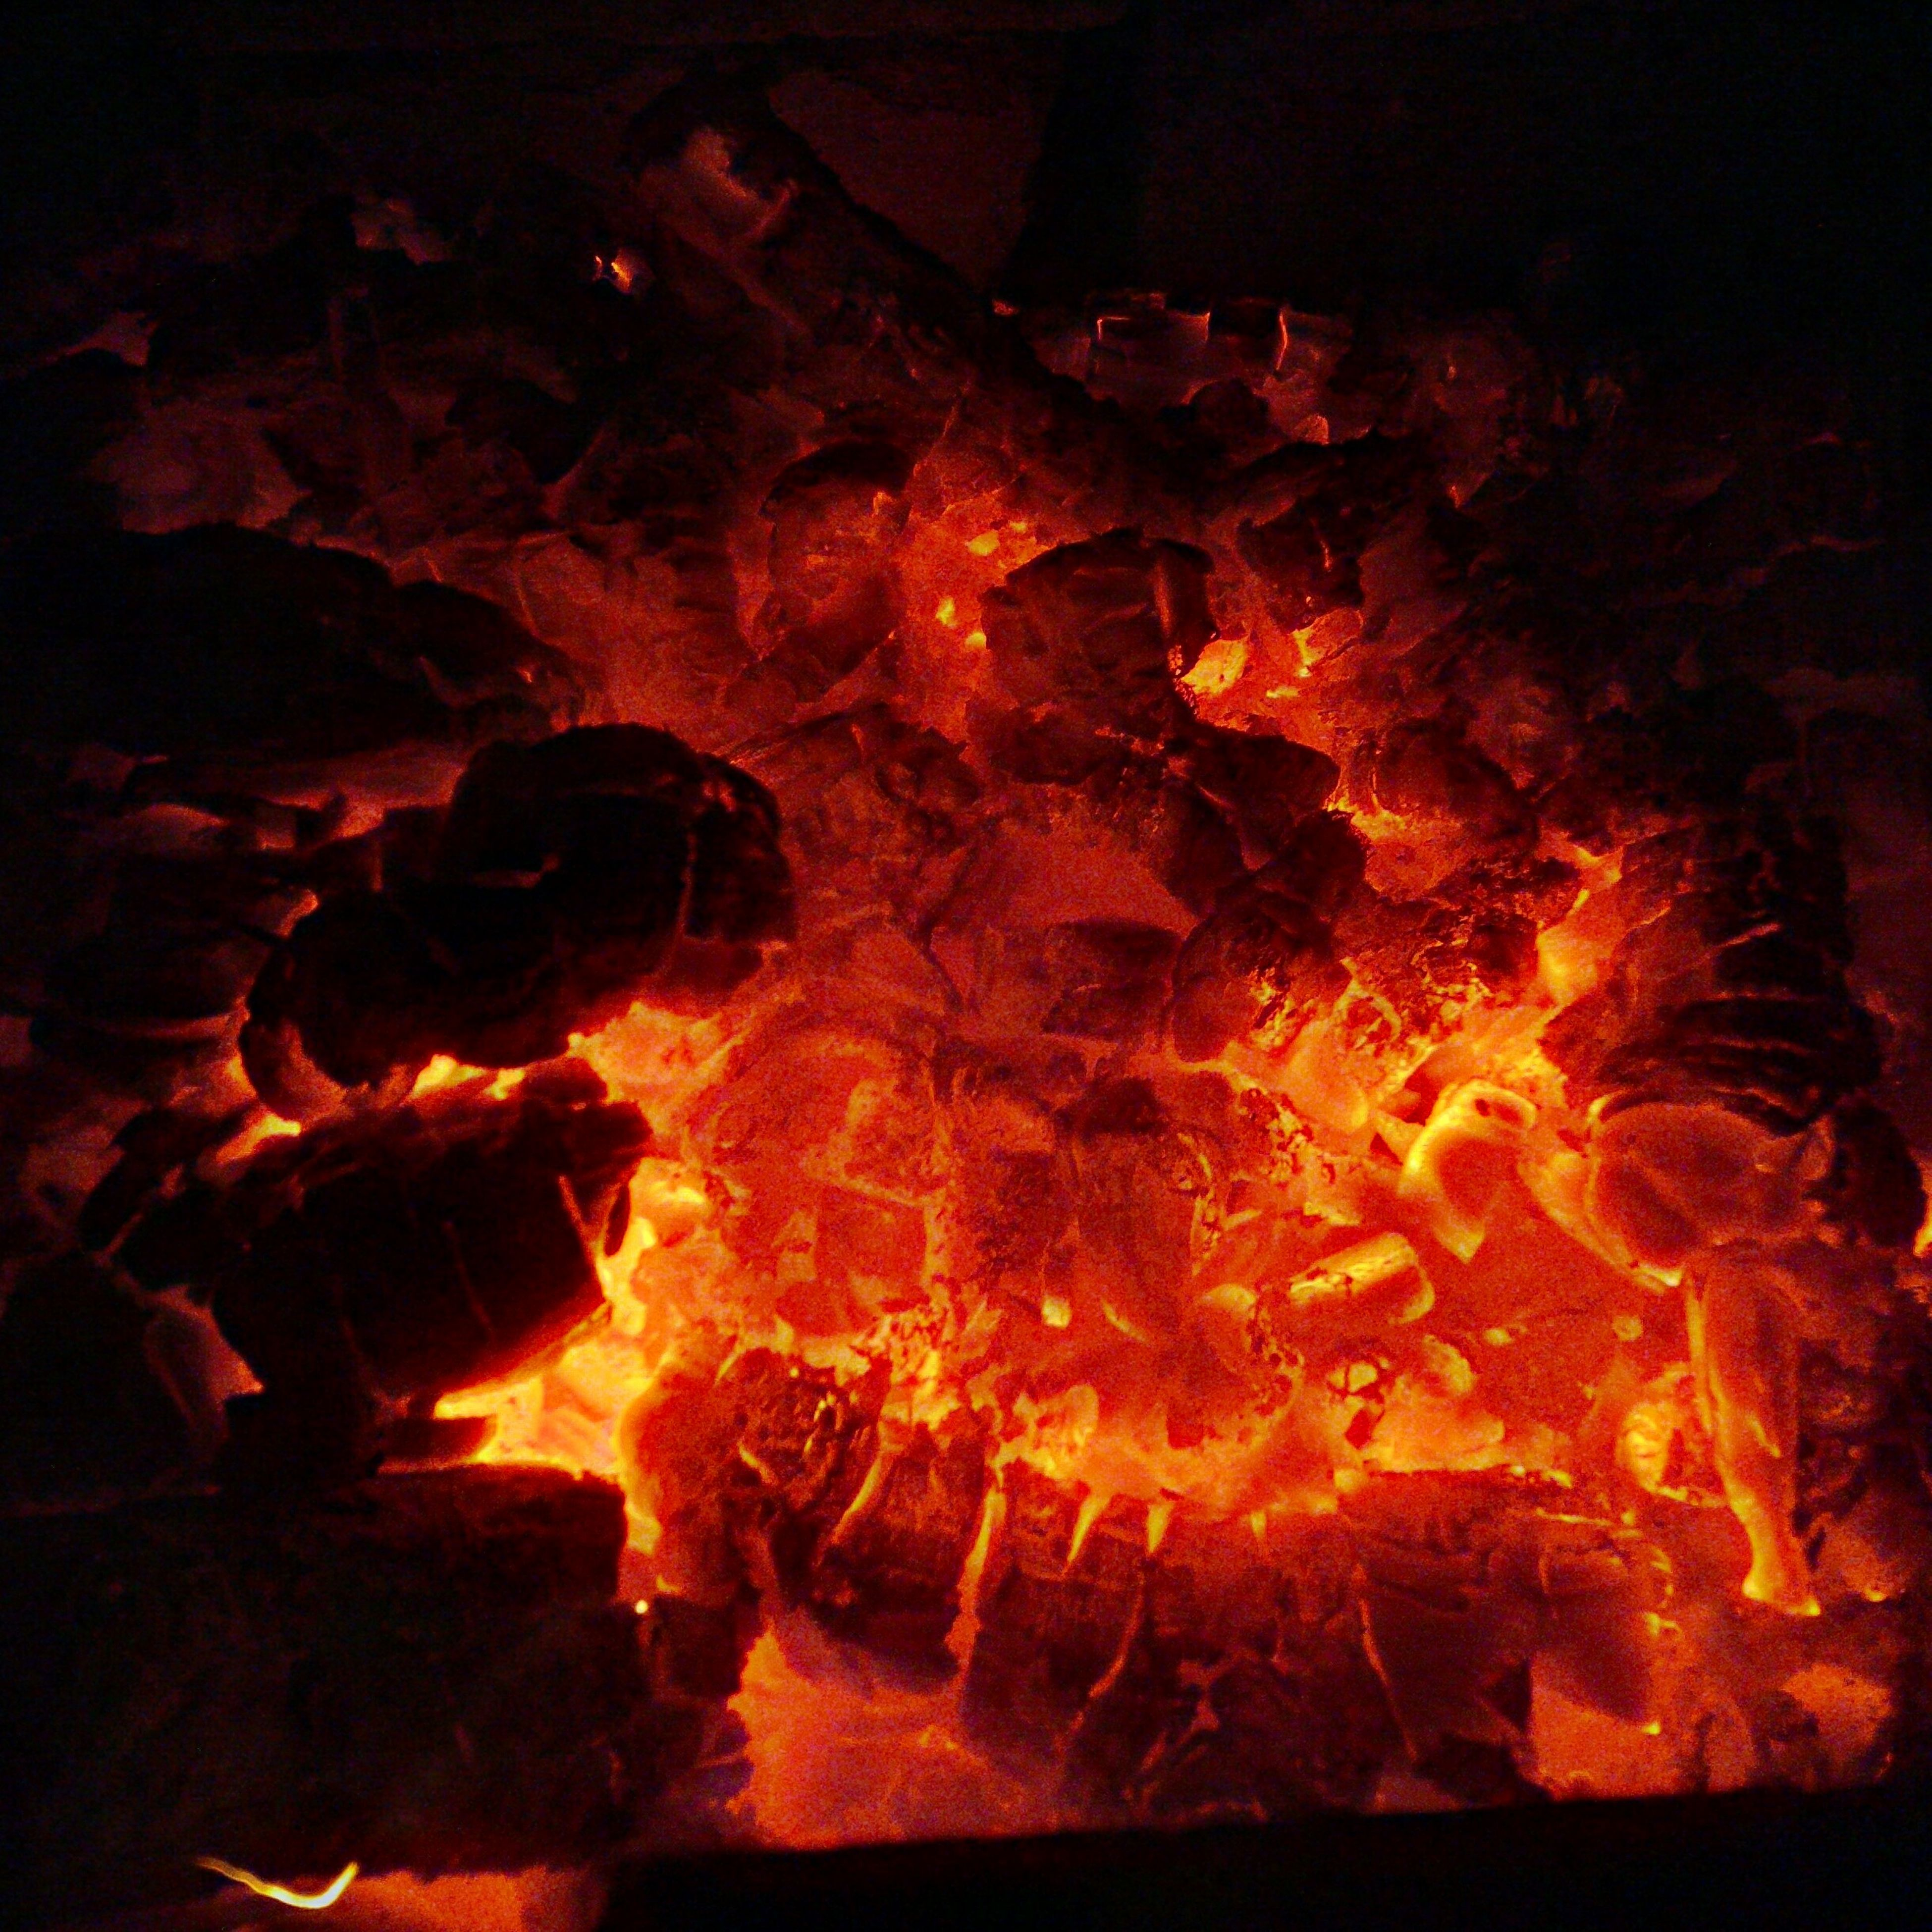 burning, fire - natural phenomenon, flame, heat - temperature, night, bonfire, glowing, firewood, illuminated, campfire, motion, fire, long exposure, heat, dark, orange color, close-up, light - natural phenomenon, fireplace, no people